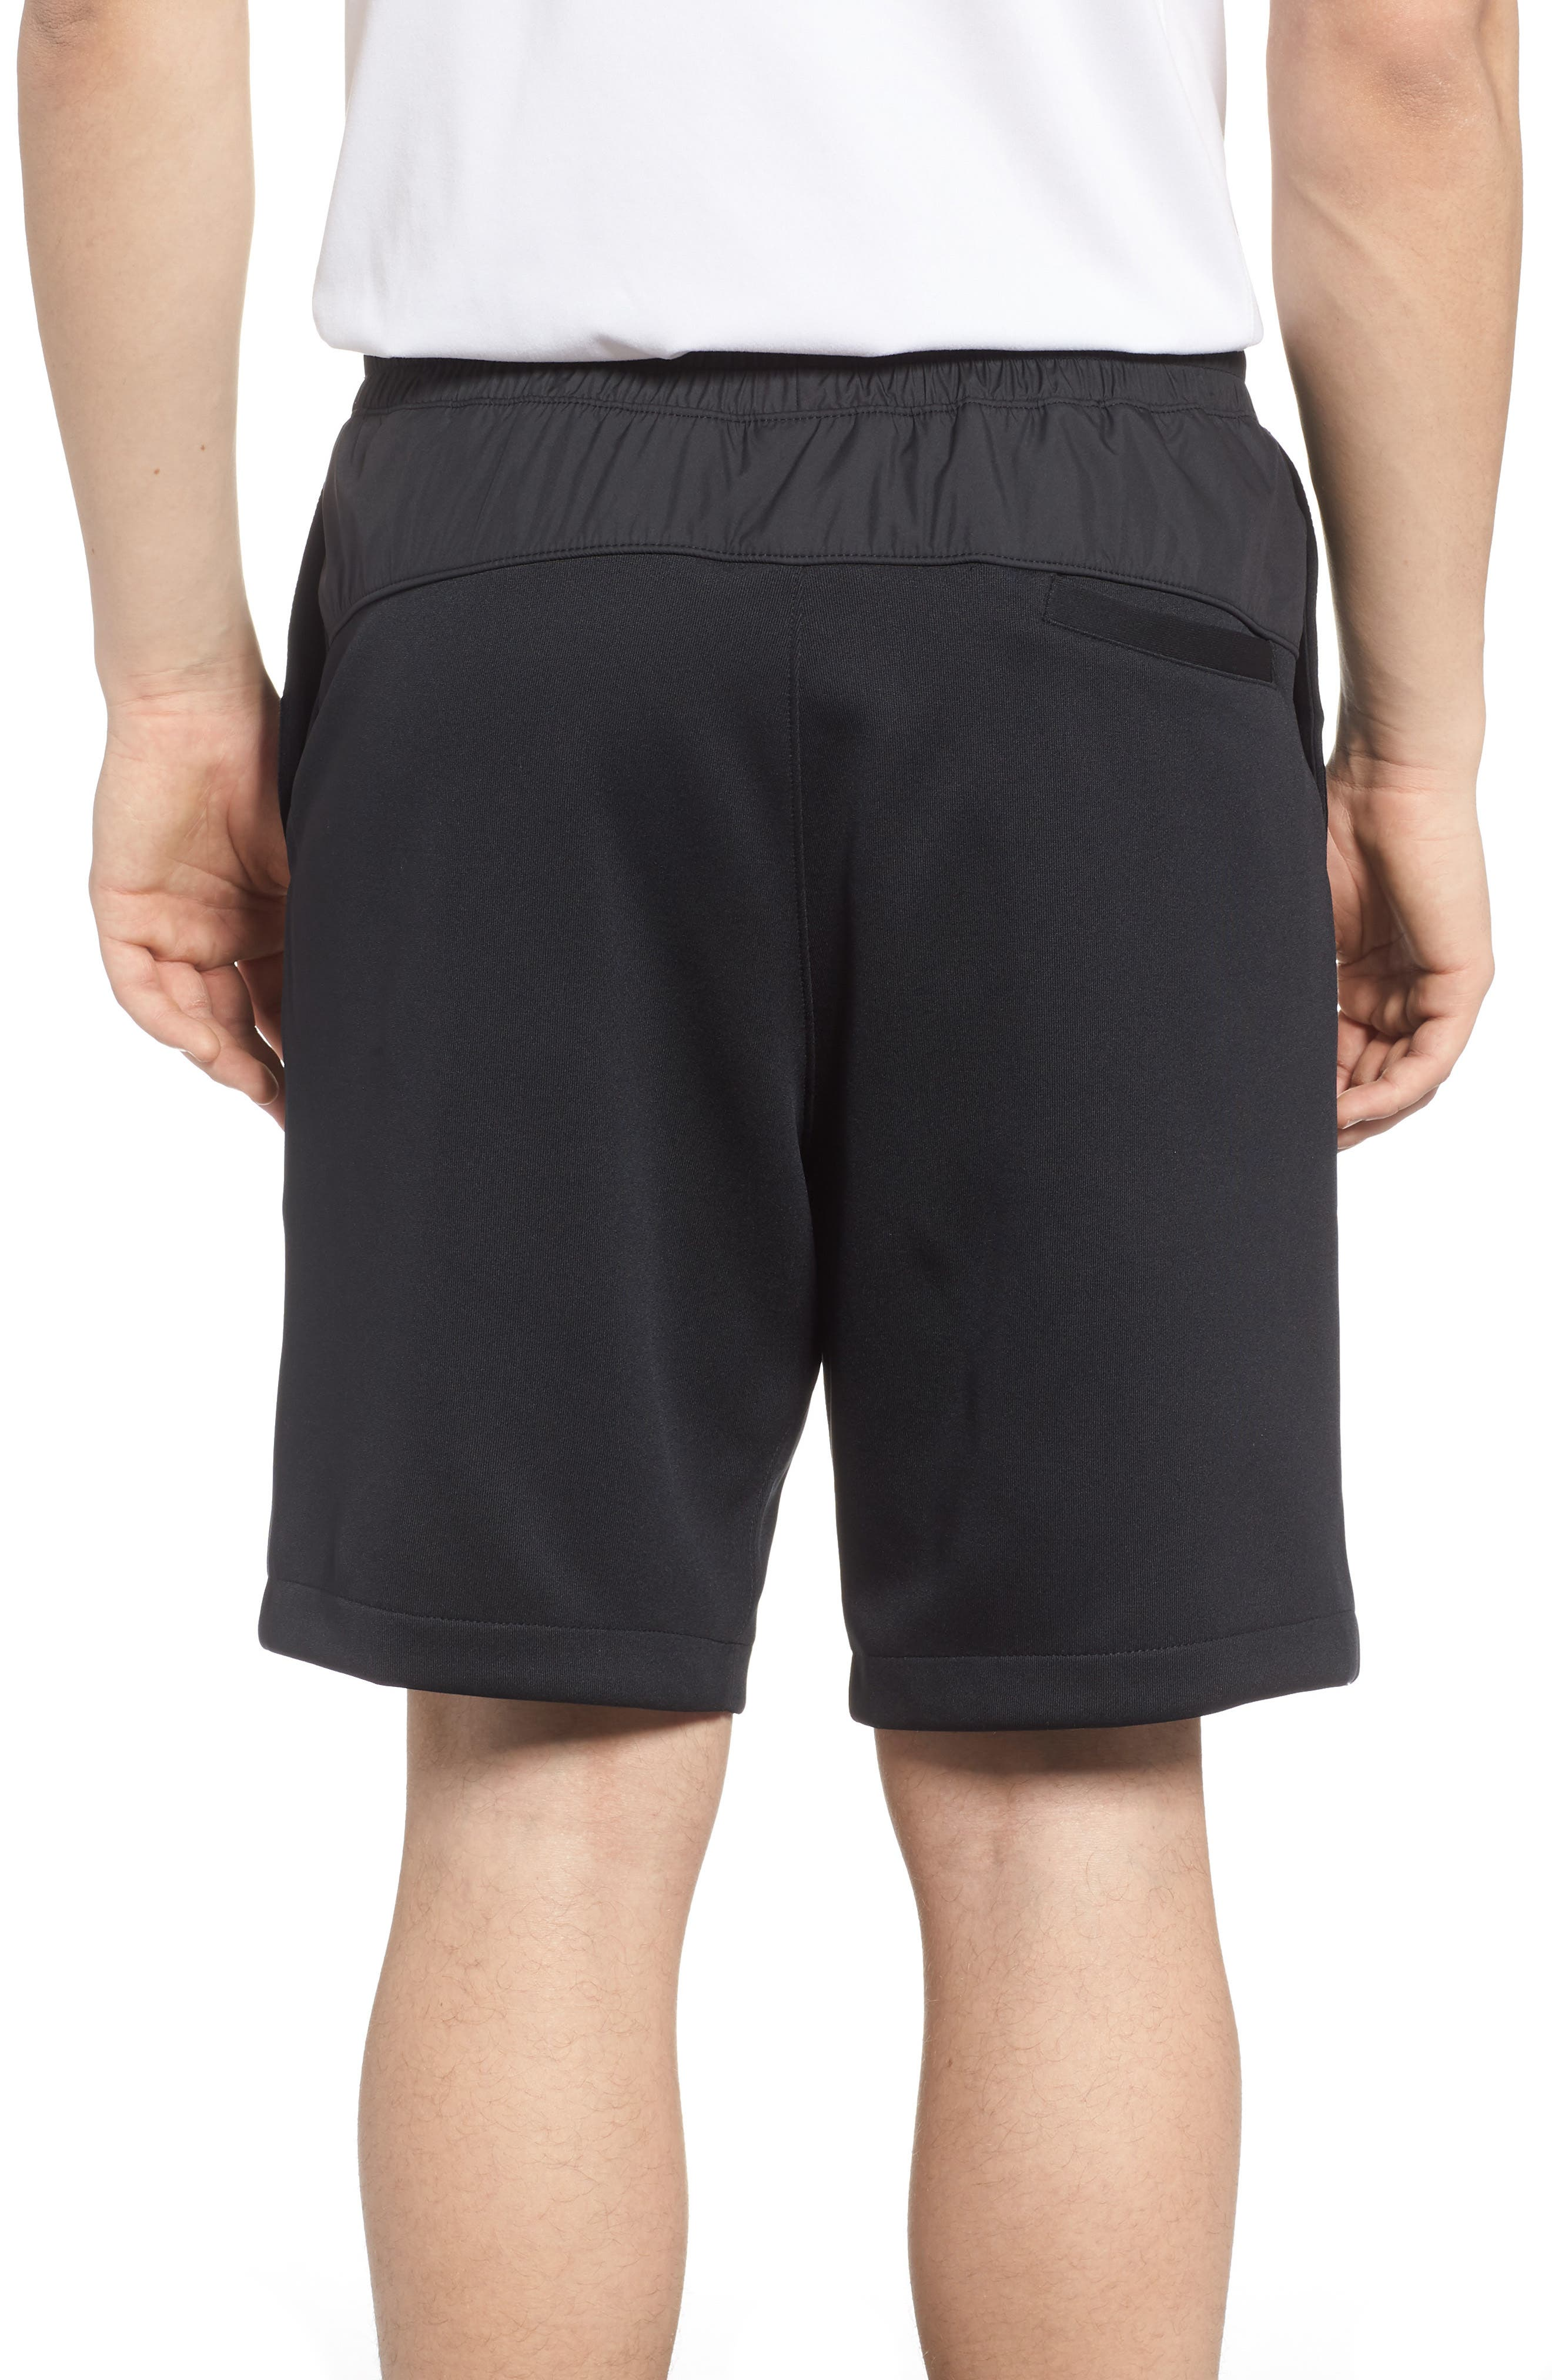 Sportswear Air Max Shorts,                             Alternate thumbnail 2, color,                             010